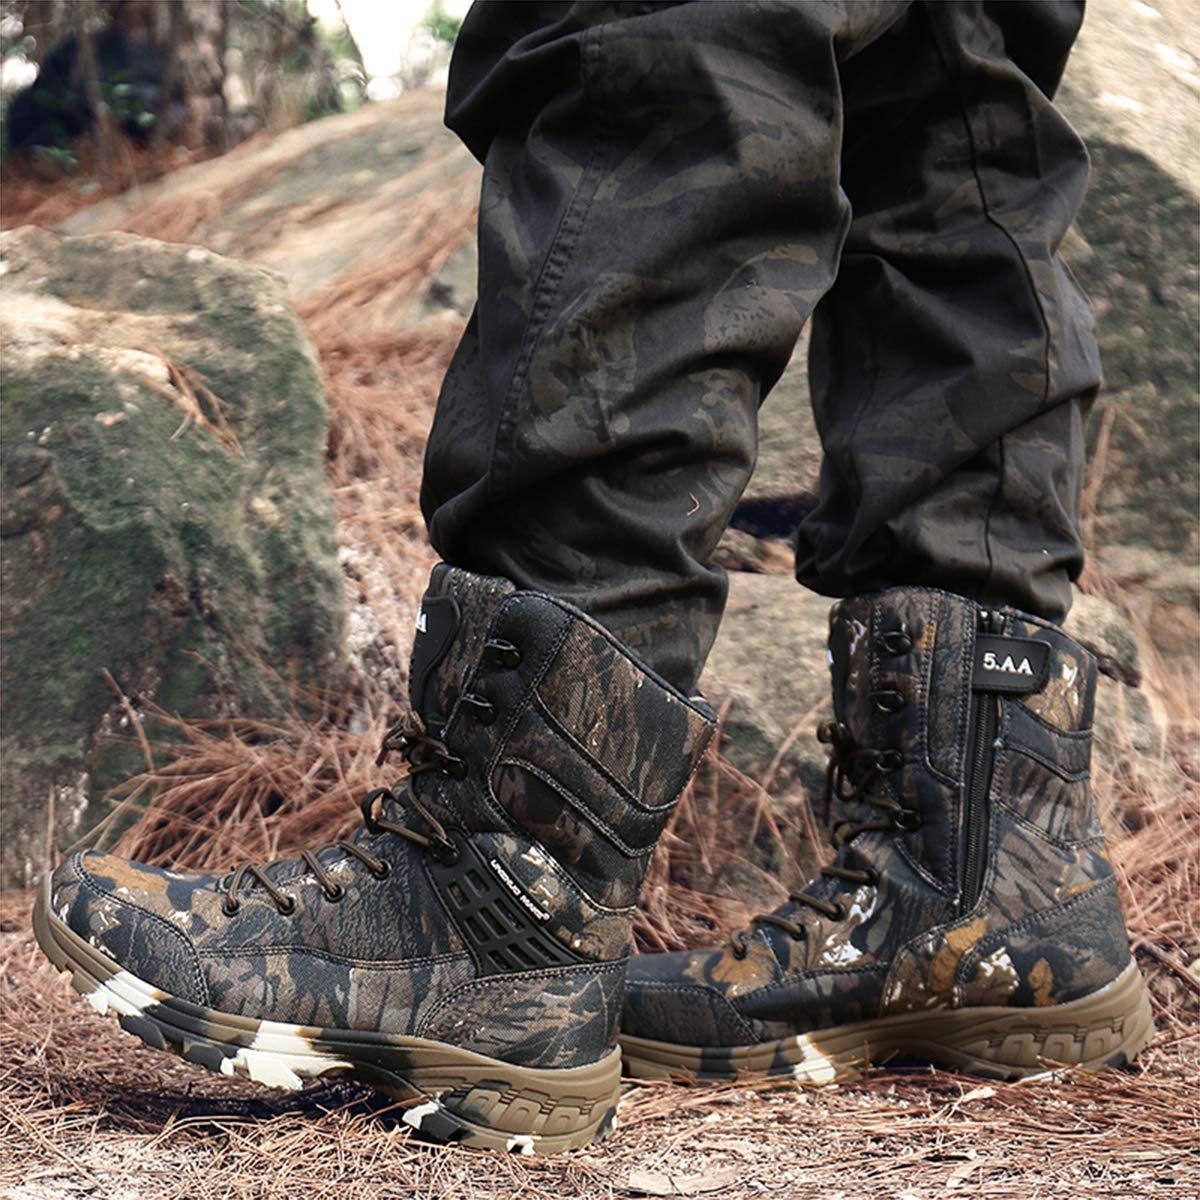 Botas Militares de Combate Impermeables para Hombres al Aire Libre Zapatos de Senderismo Altos para Entrenamiento t/áctico C/ómodas Botas de Trekking Camuflaje Transpirables